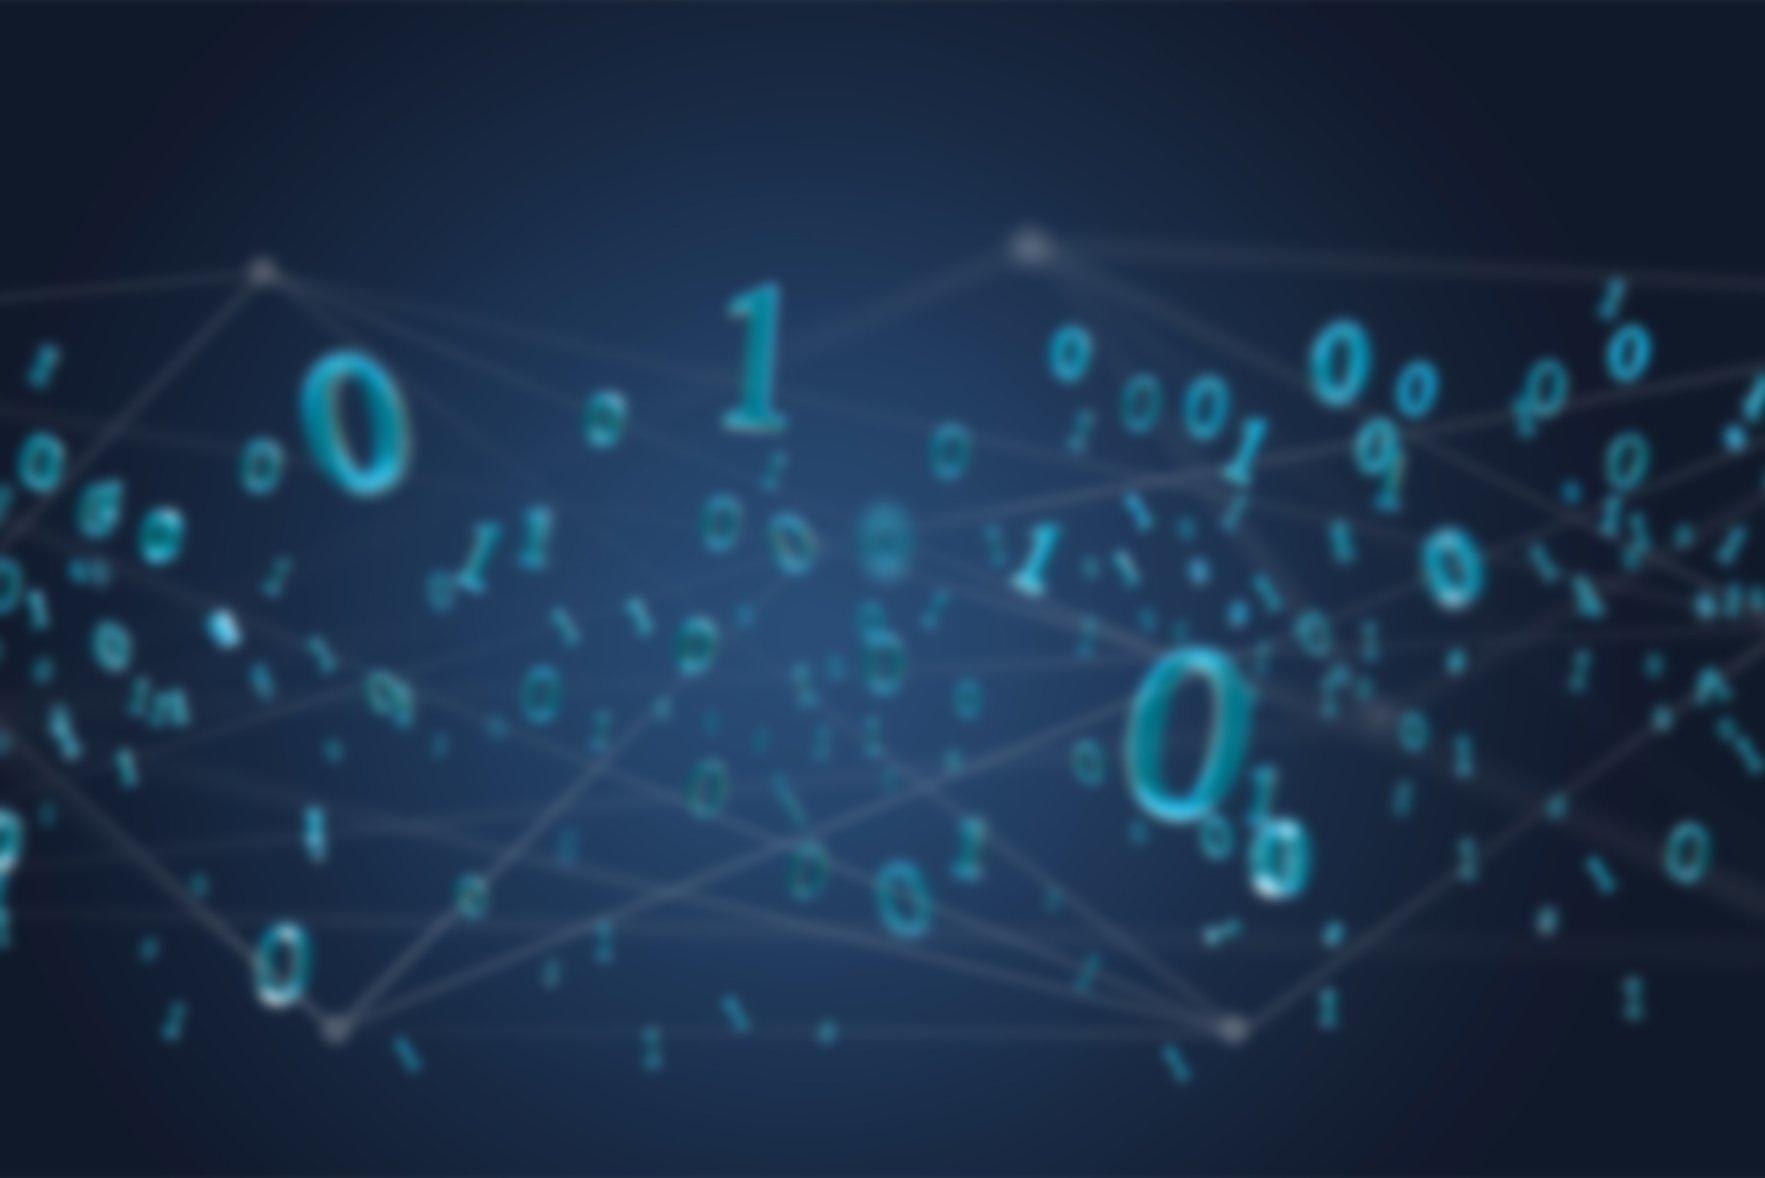 Veeam cloud backup gains tiering, mobility, AWS enhancements